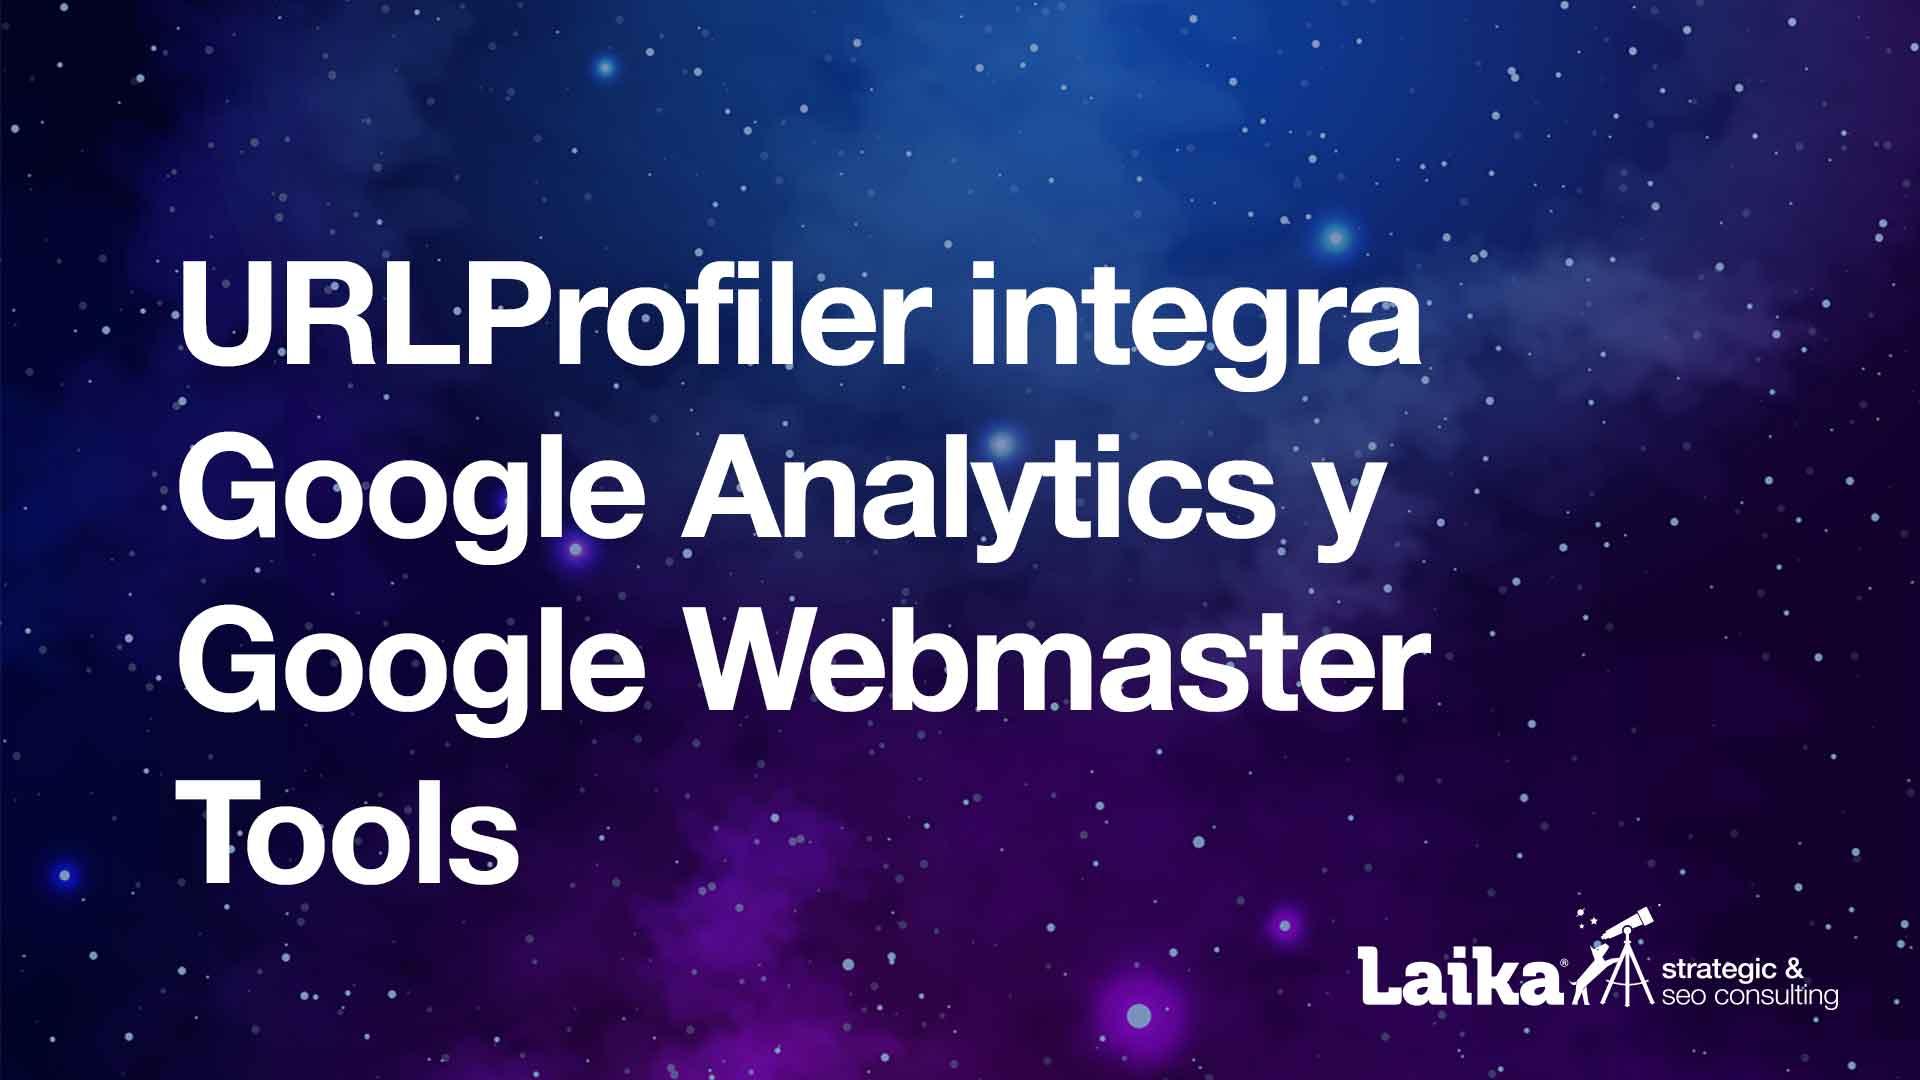 URLProfiler integra Google Analytics y Google Webmaster Tools